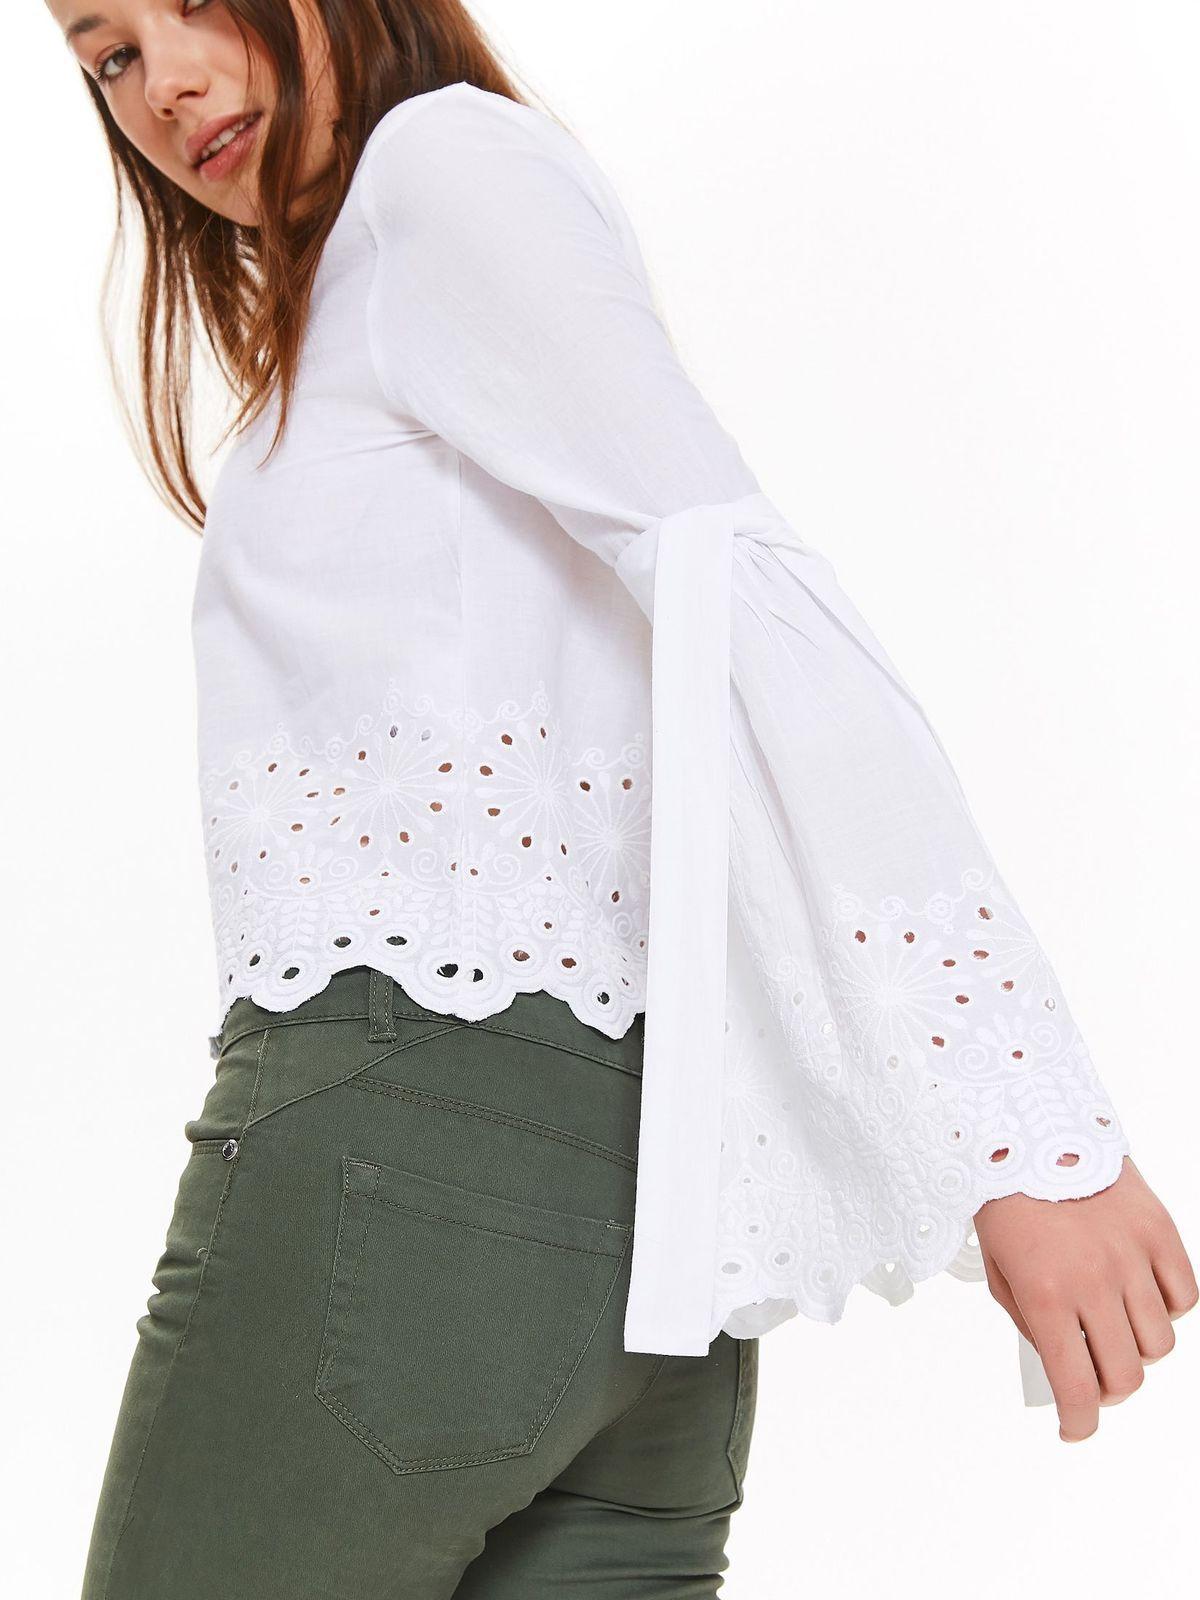 552494eafb Bluzka damska bluzka długi rękaw biała - TBD0144 o luźnym kroju